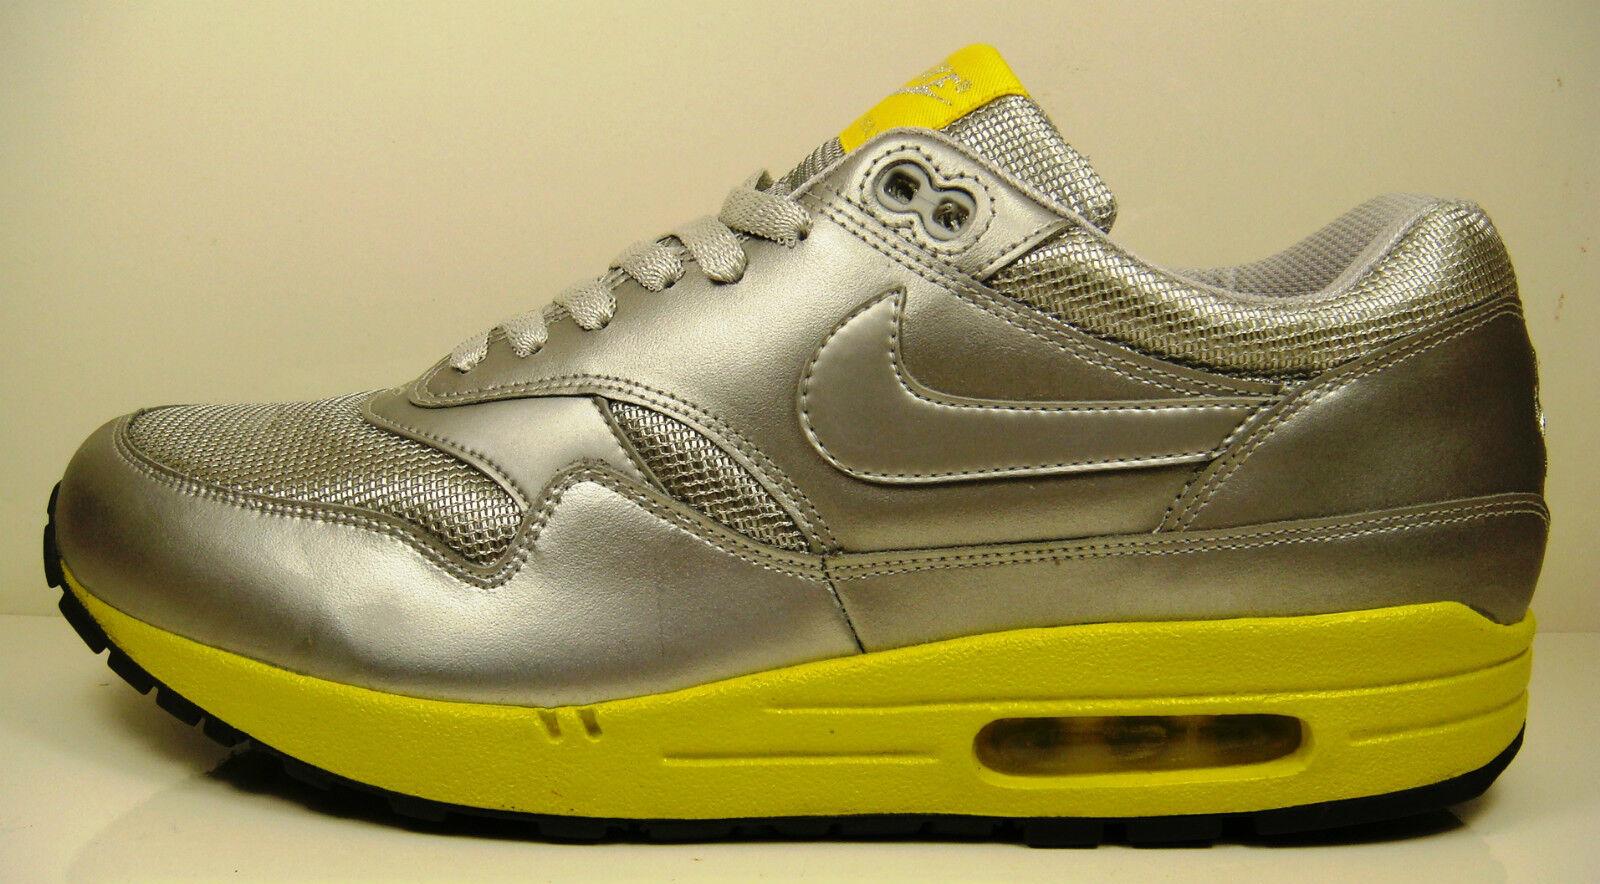 Nike Air Max 1 Premium 10 309717-002 11 Rare 2007 CMYK 309717-002 10 Atmos B OG 90 TZ QS DS 3bf8bb